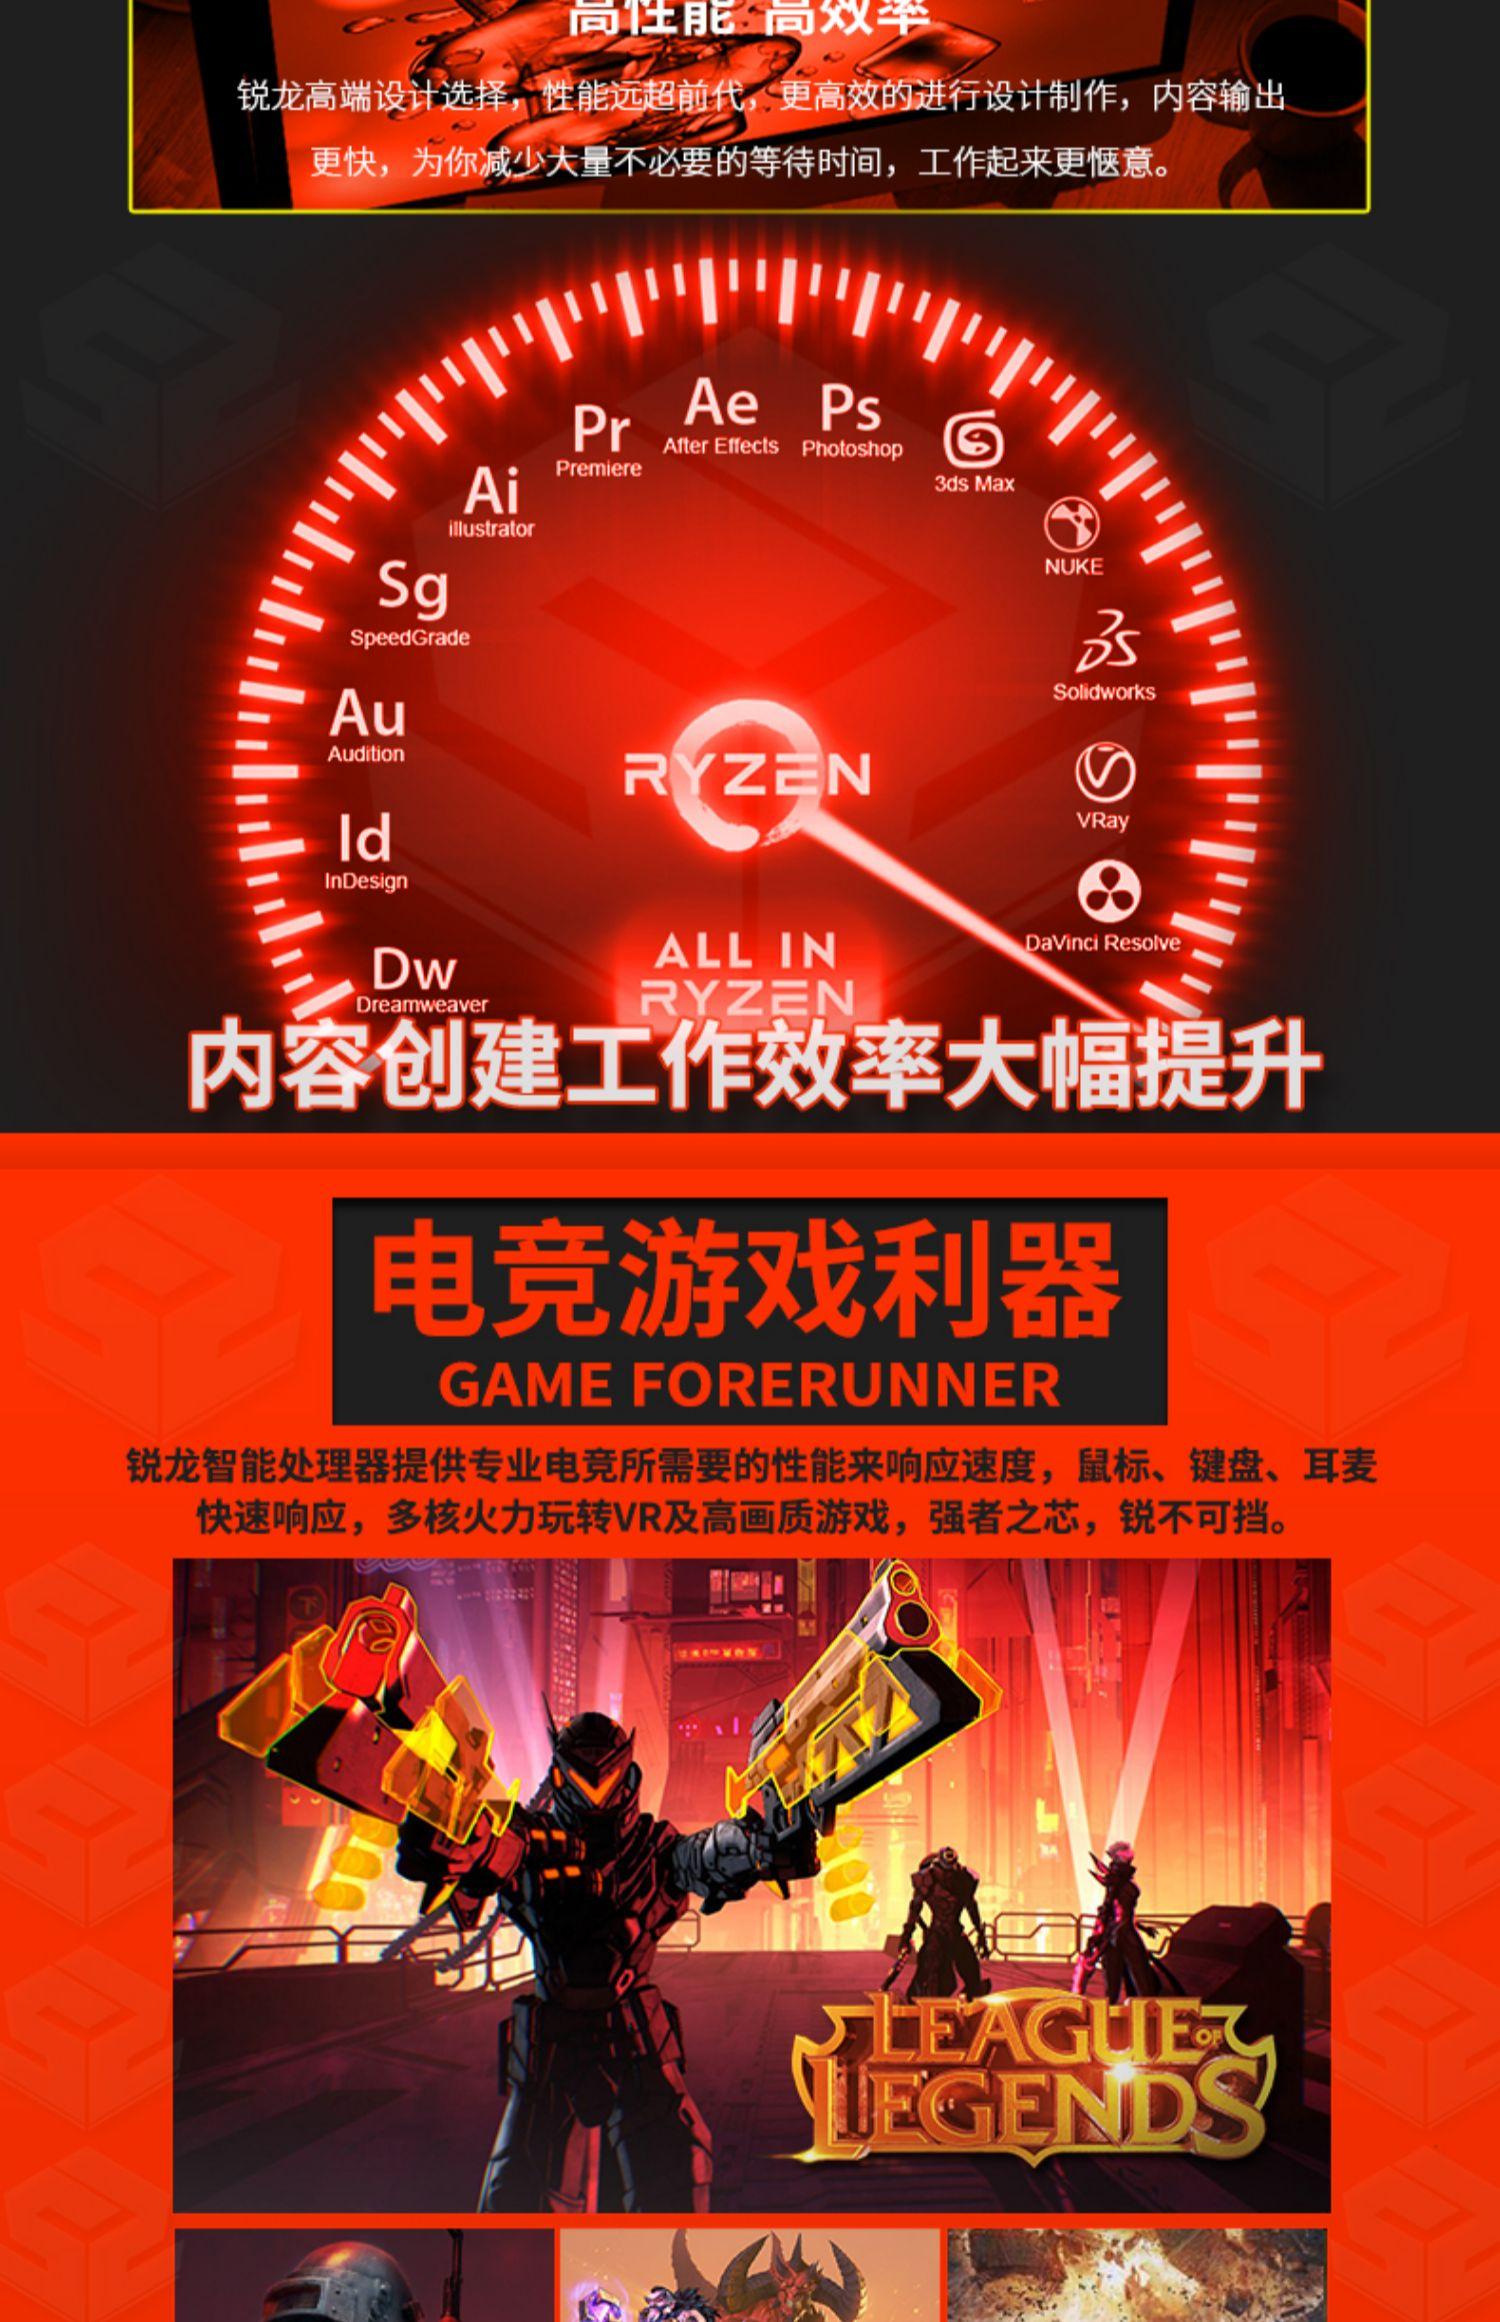 AMD锐龙R5 3600/3600X搭微星B450M MORTAR迫击炮主板CPU套装MAX商品详情图